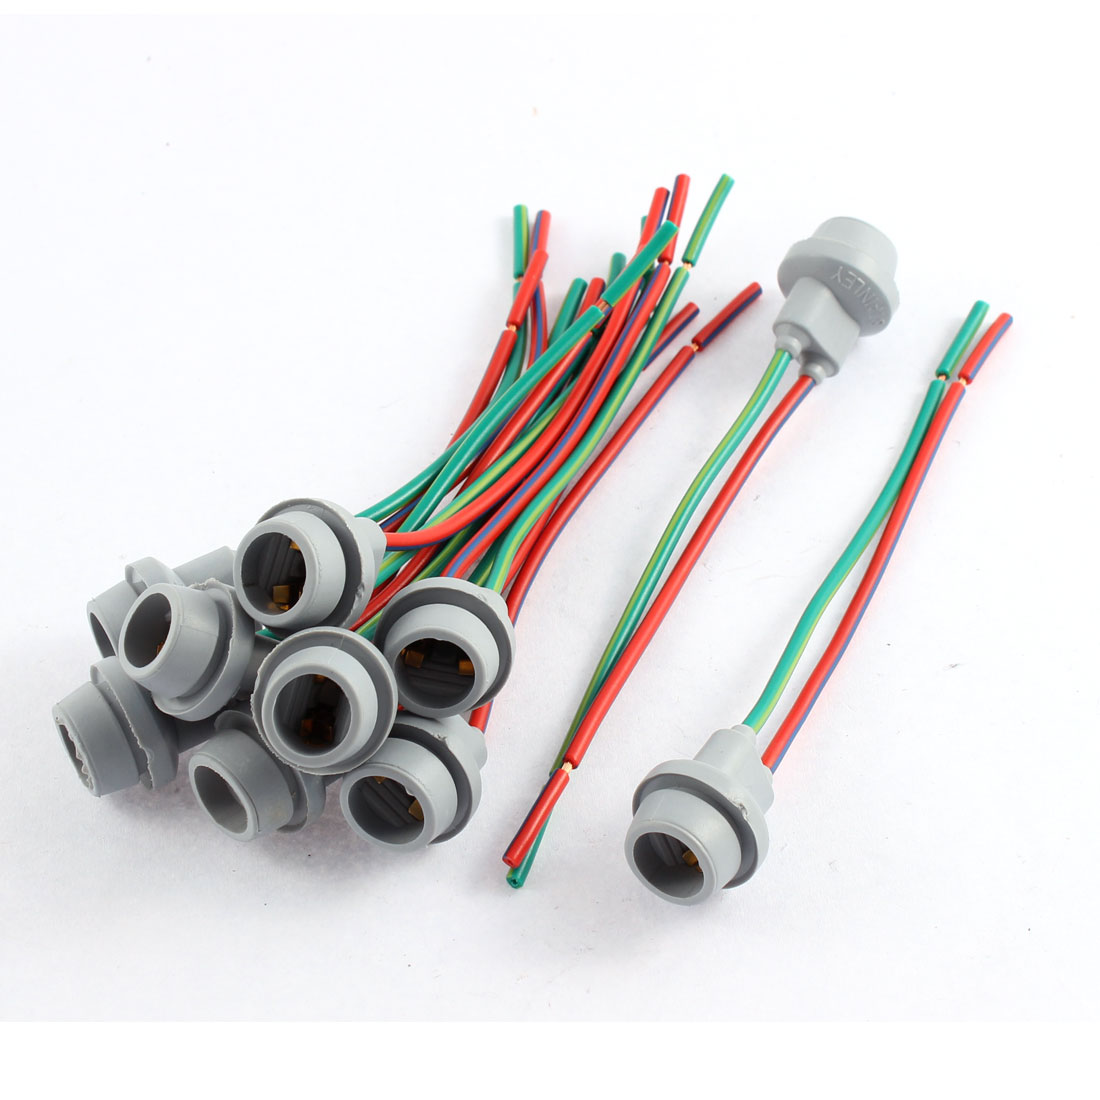 Car W5W T10 194 168 Light Socket Lamp Holder Wire Harness Connector 10 Pcs